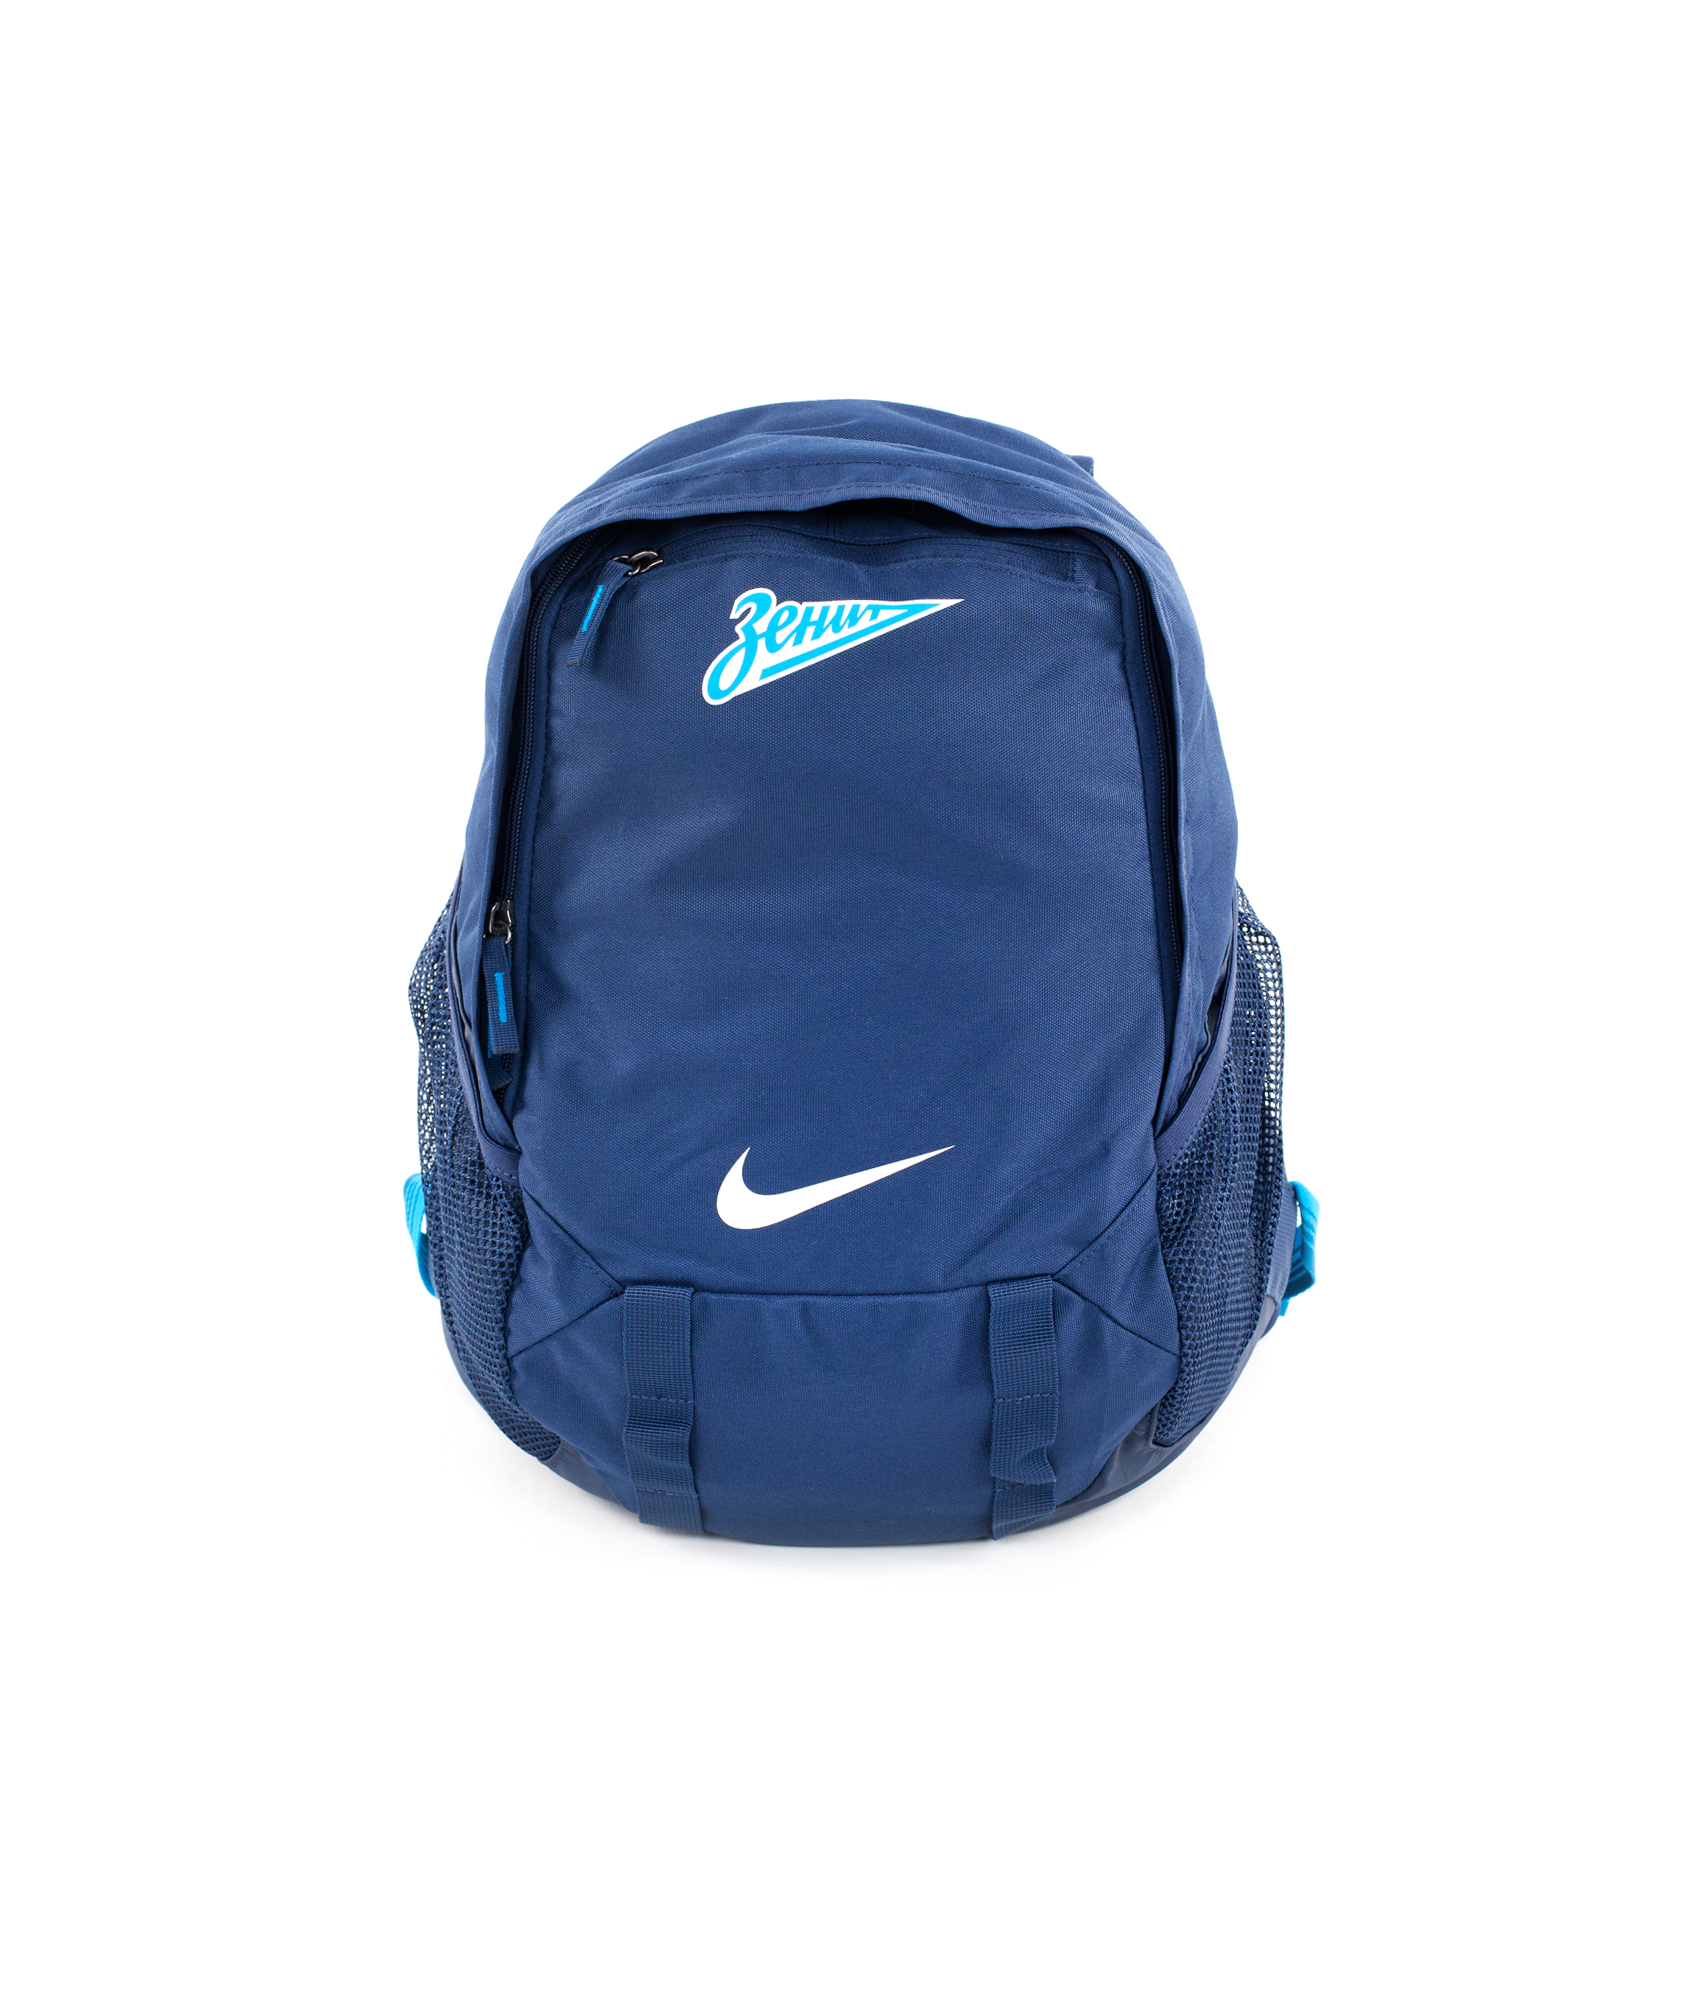 Рюкзак Nike Allegiance ZENIT OFFENSE COMPA, Цвет-Темно-Синий, Размер-MISC